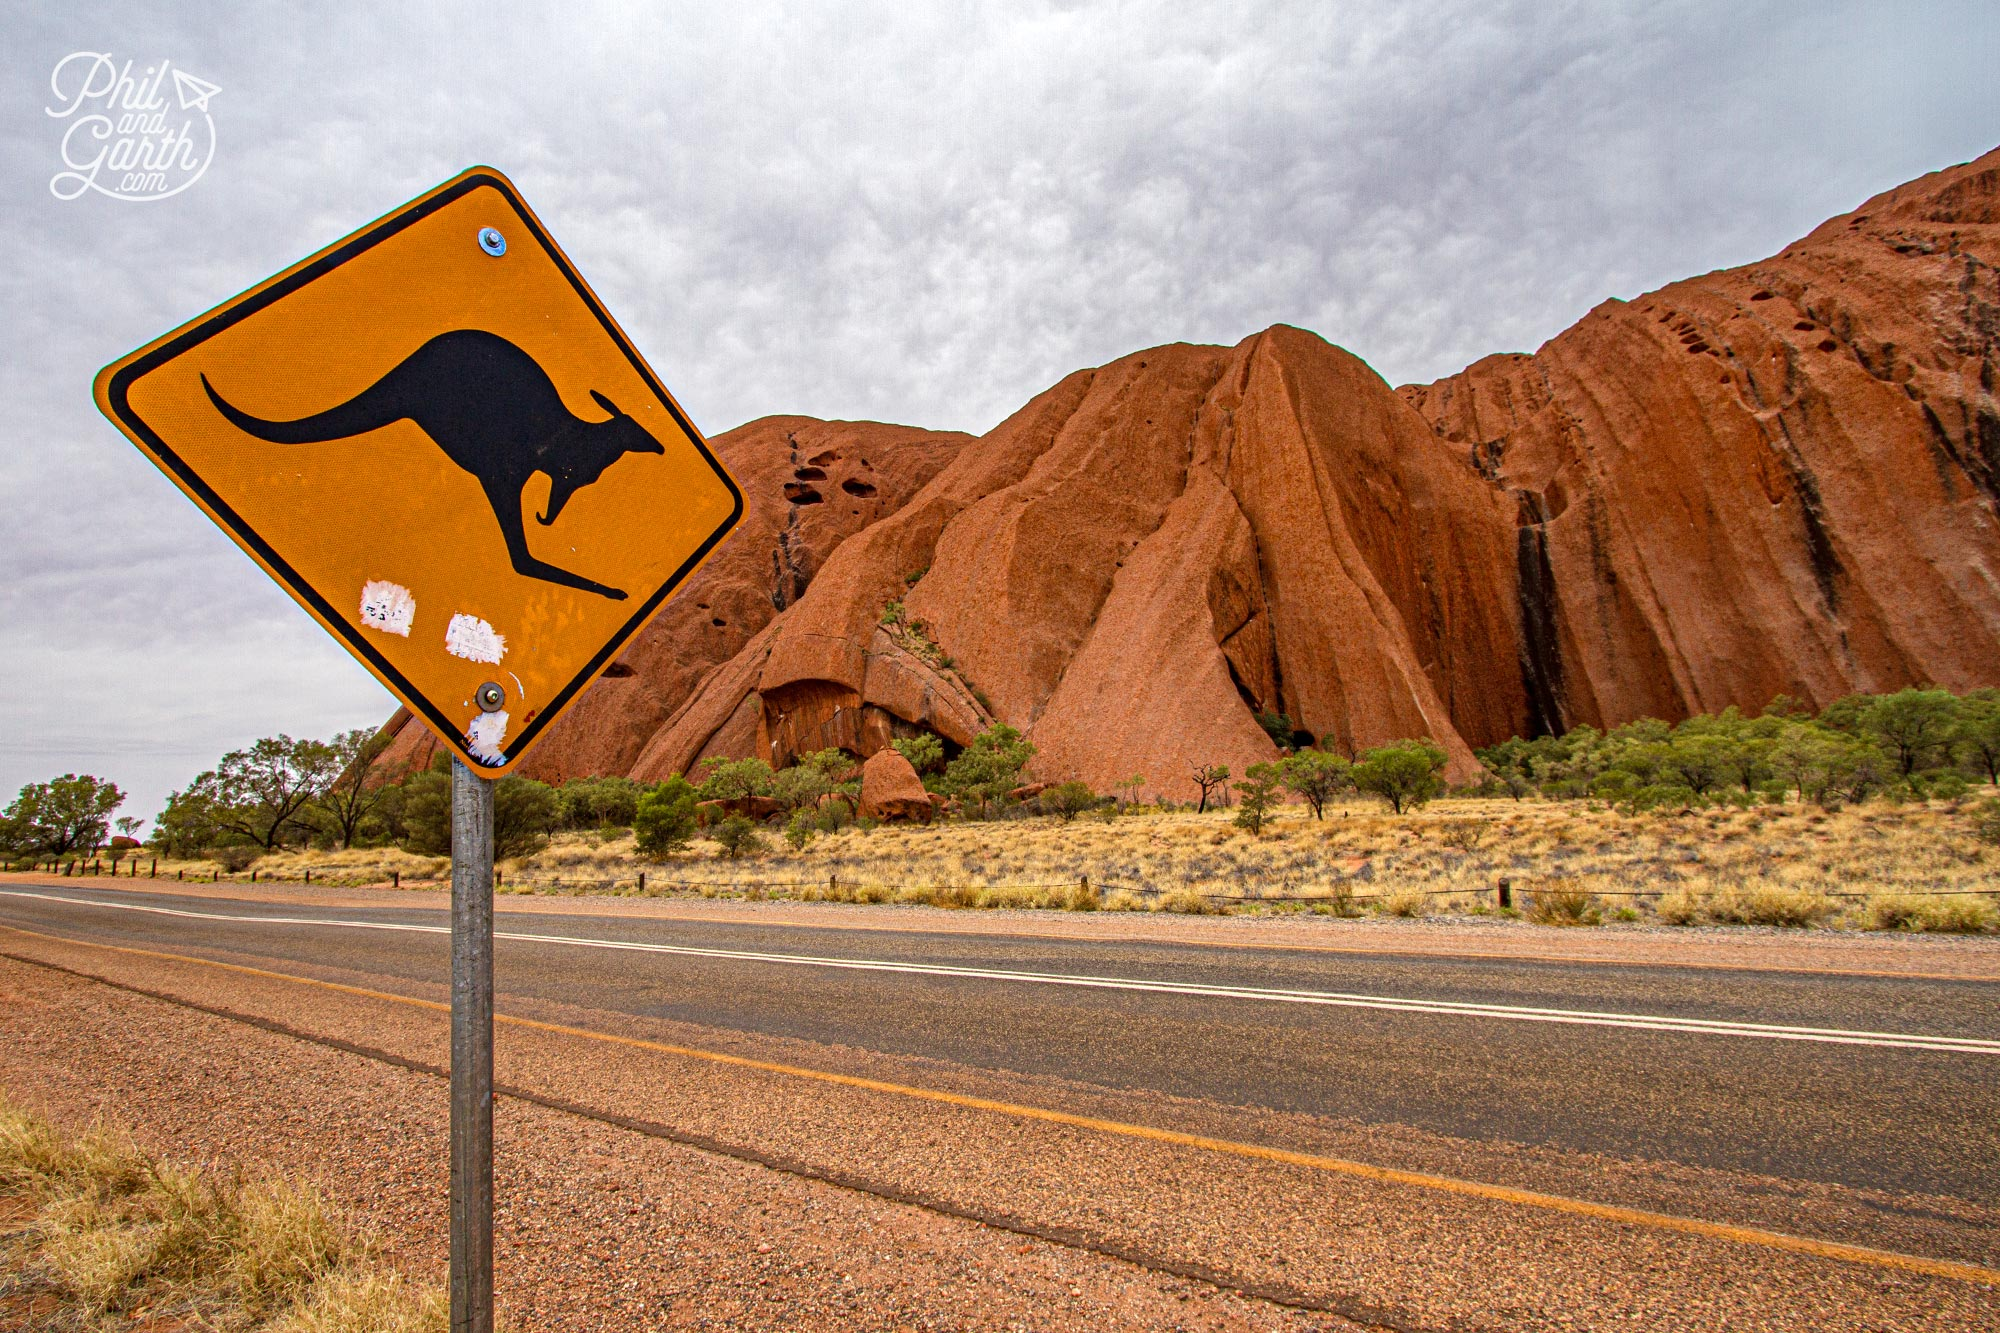 Driving around Uluru-Kata Tjuta National Park is really easy